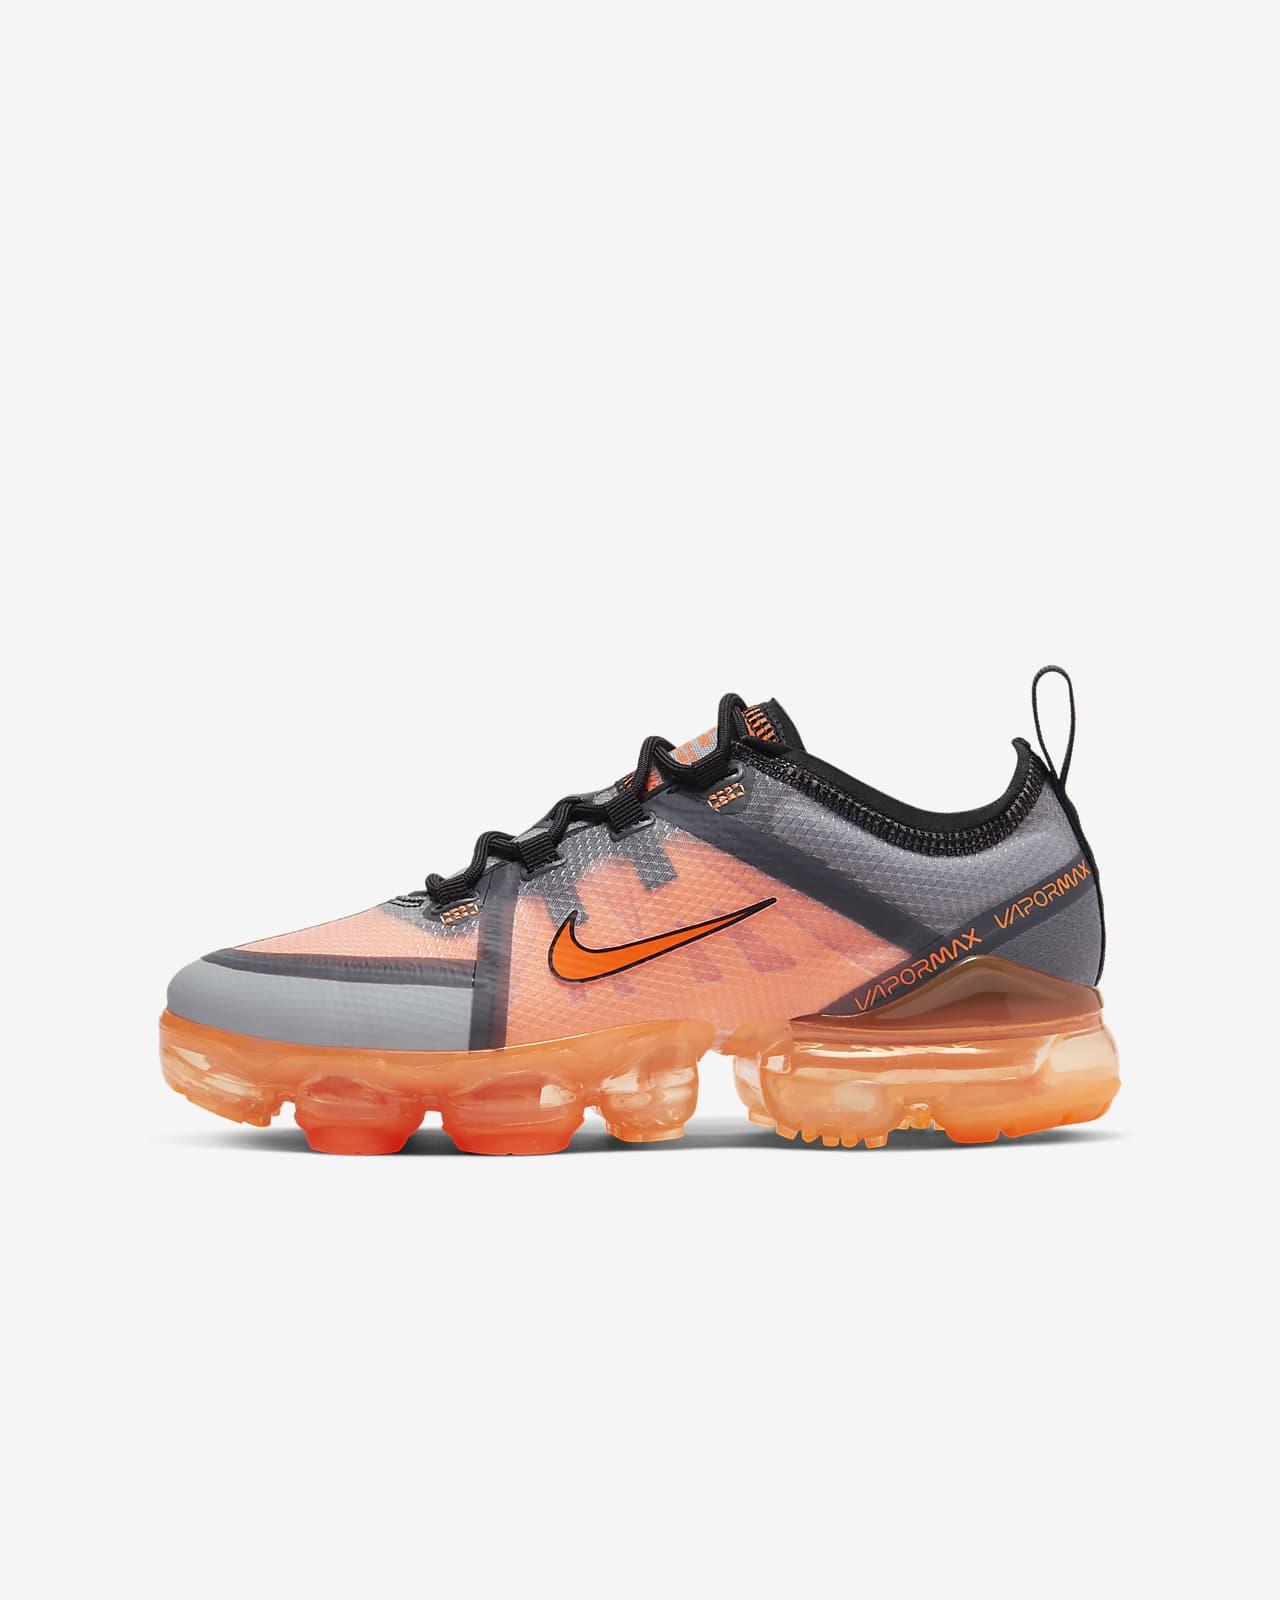 Nike Air VaporMax 2019 Schuh für ältere